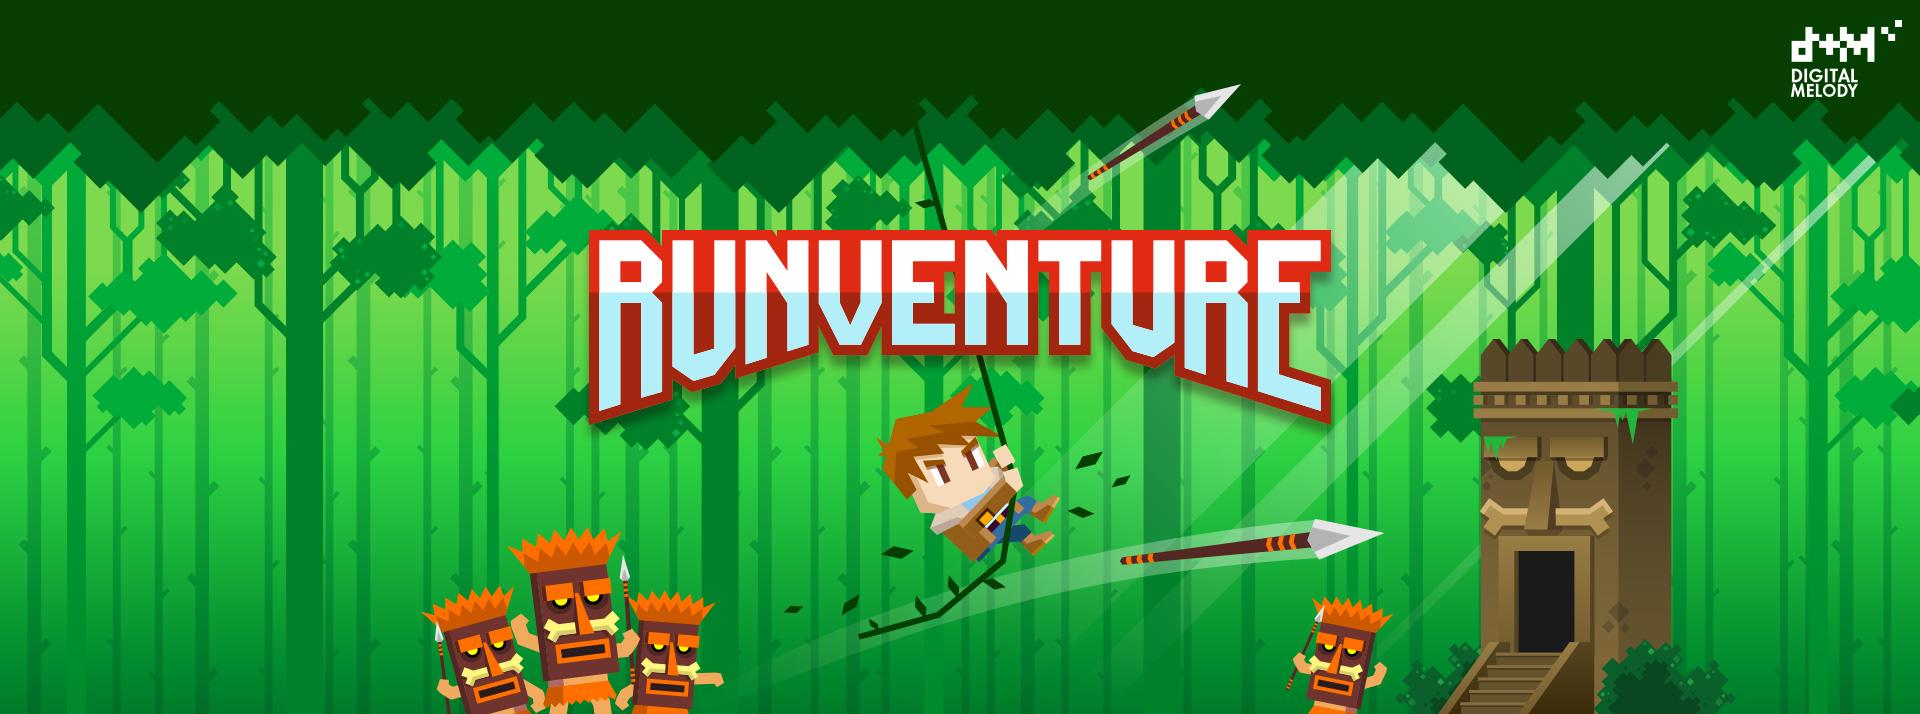 Digital Melody Games - Runventure